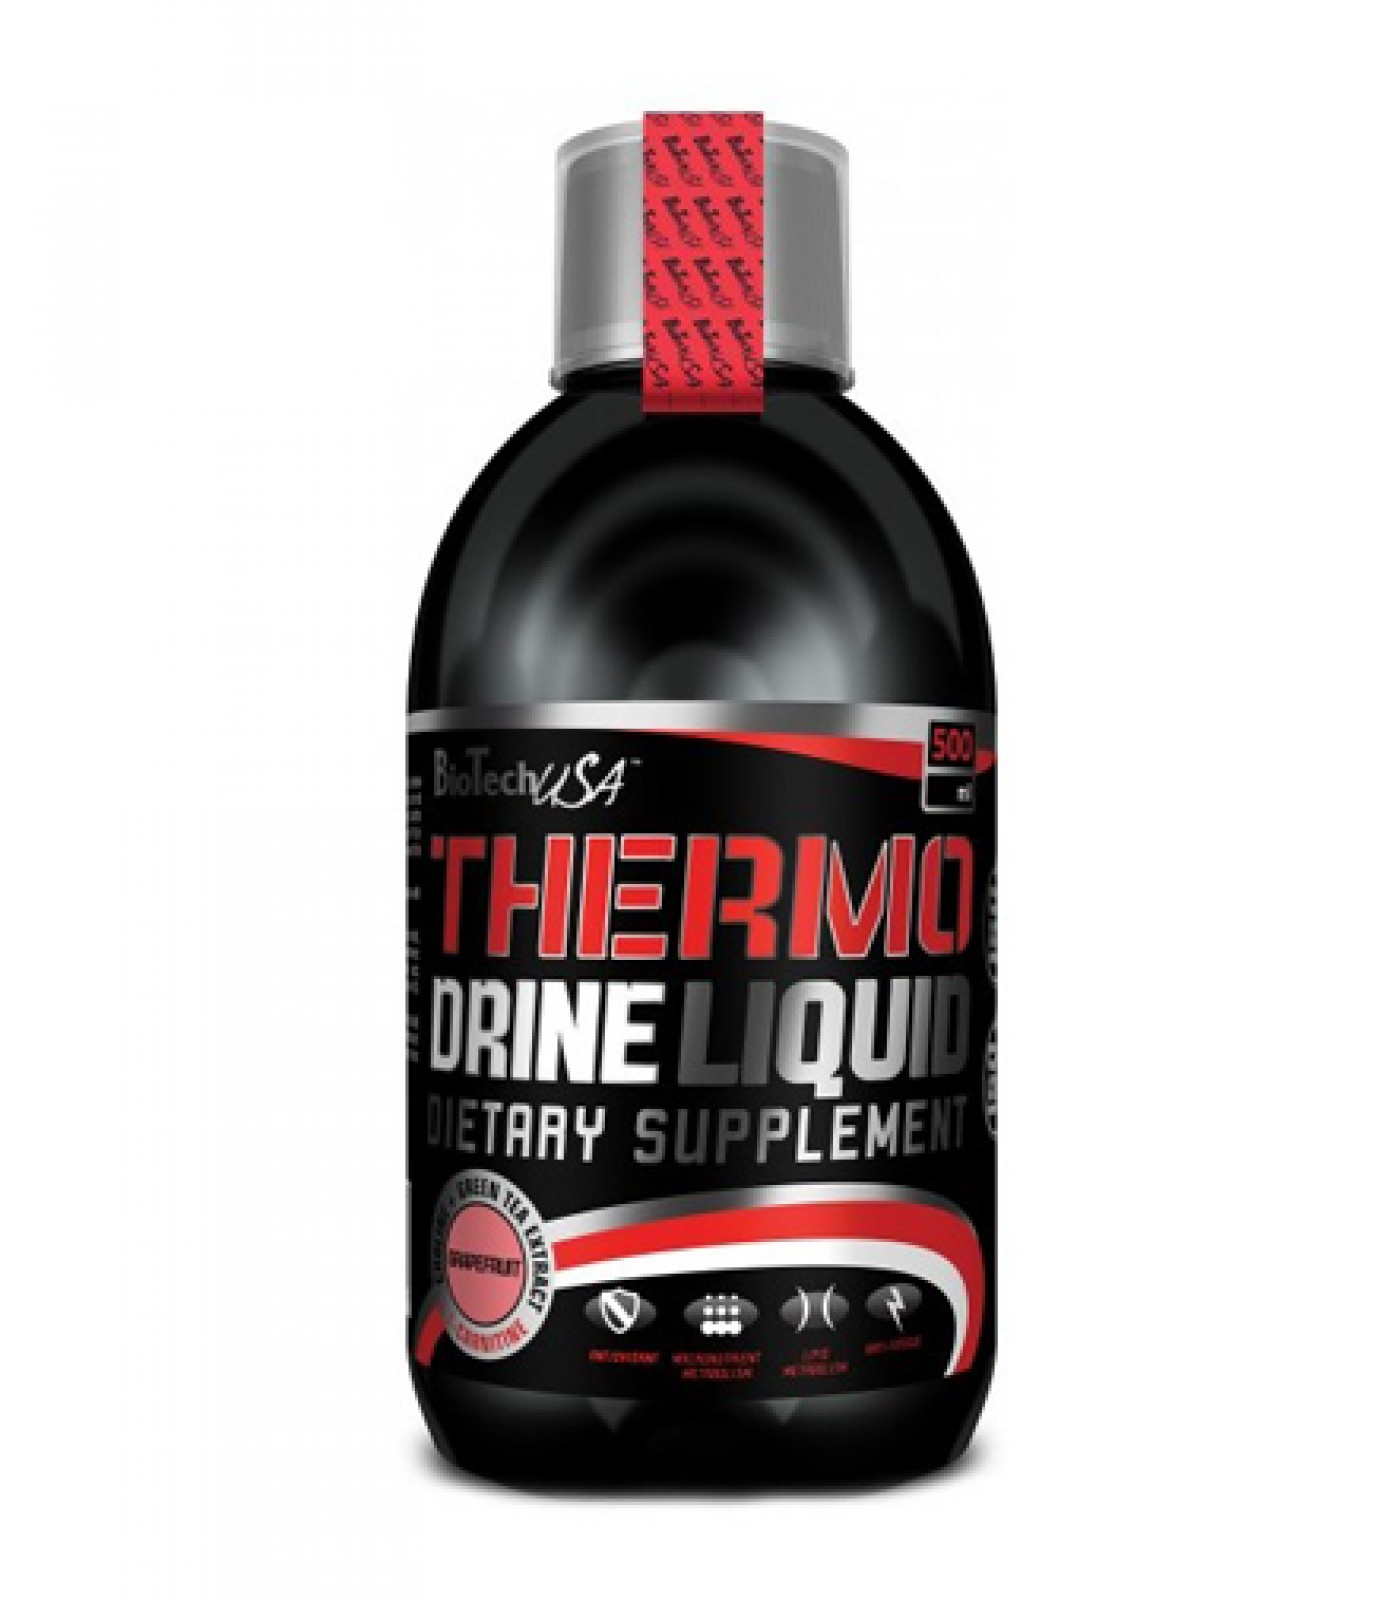 BioTech - Thermo Drine Liquid / 500 ml